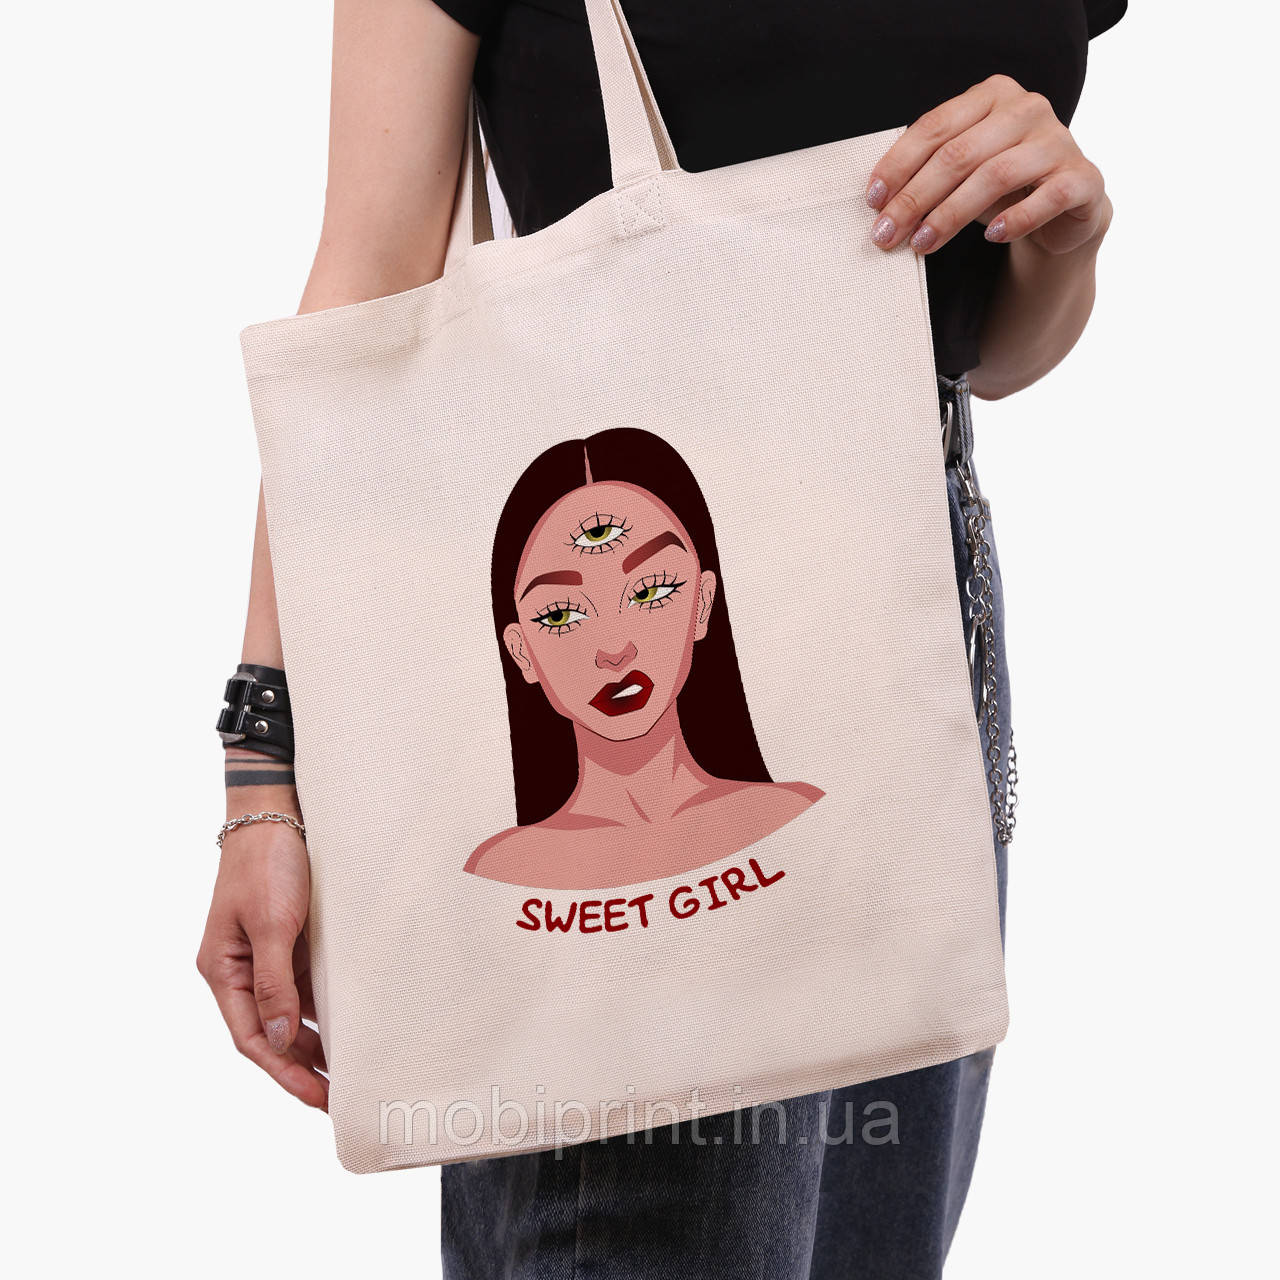 Эко сумка шоппер Милая девушка Диджитал Арт (Sweet girl) (9227-1634)  экосумка шопер 41*35 см